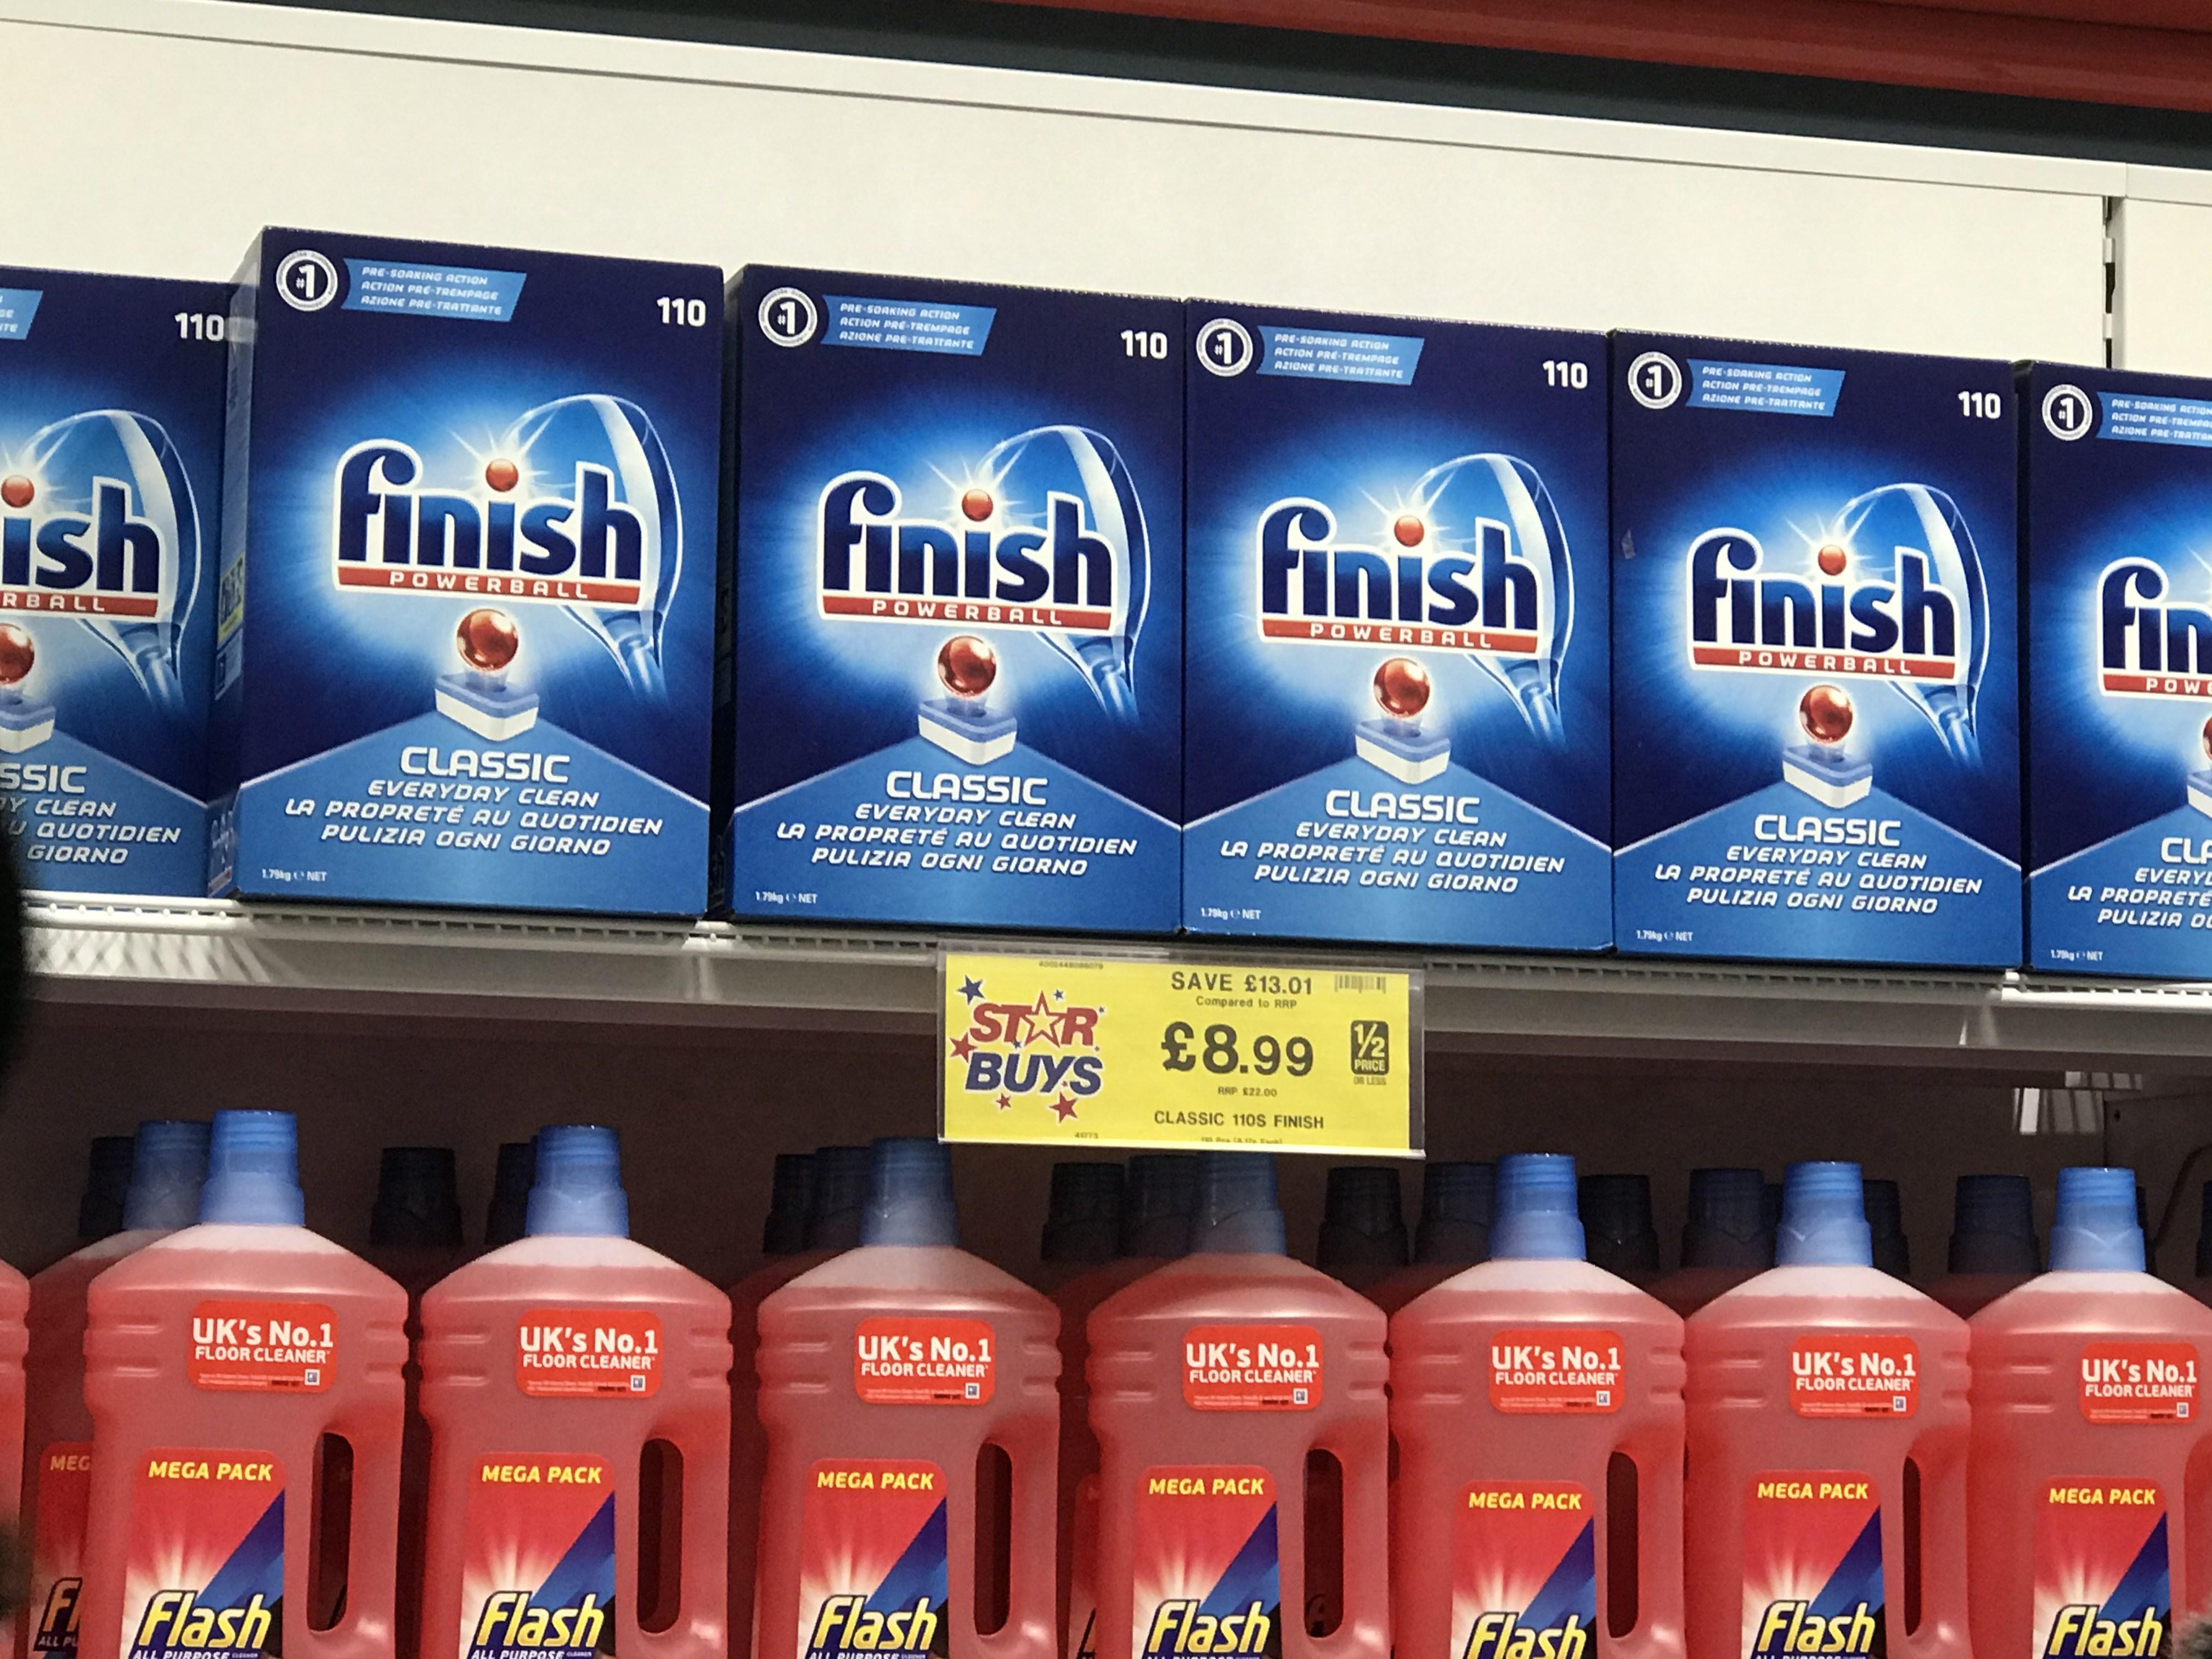 Finish classic 110 dishwasher tablets - £8.99 - Homebargains